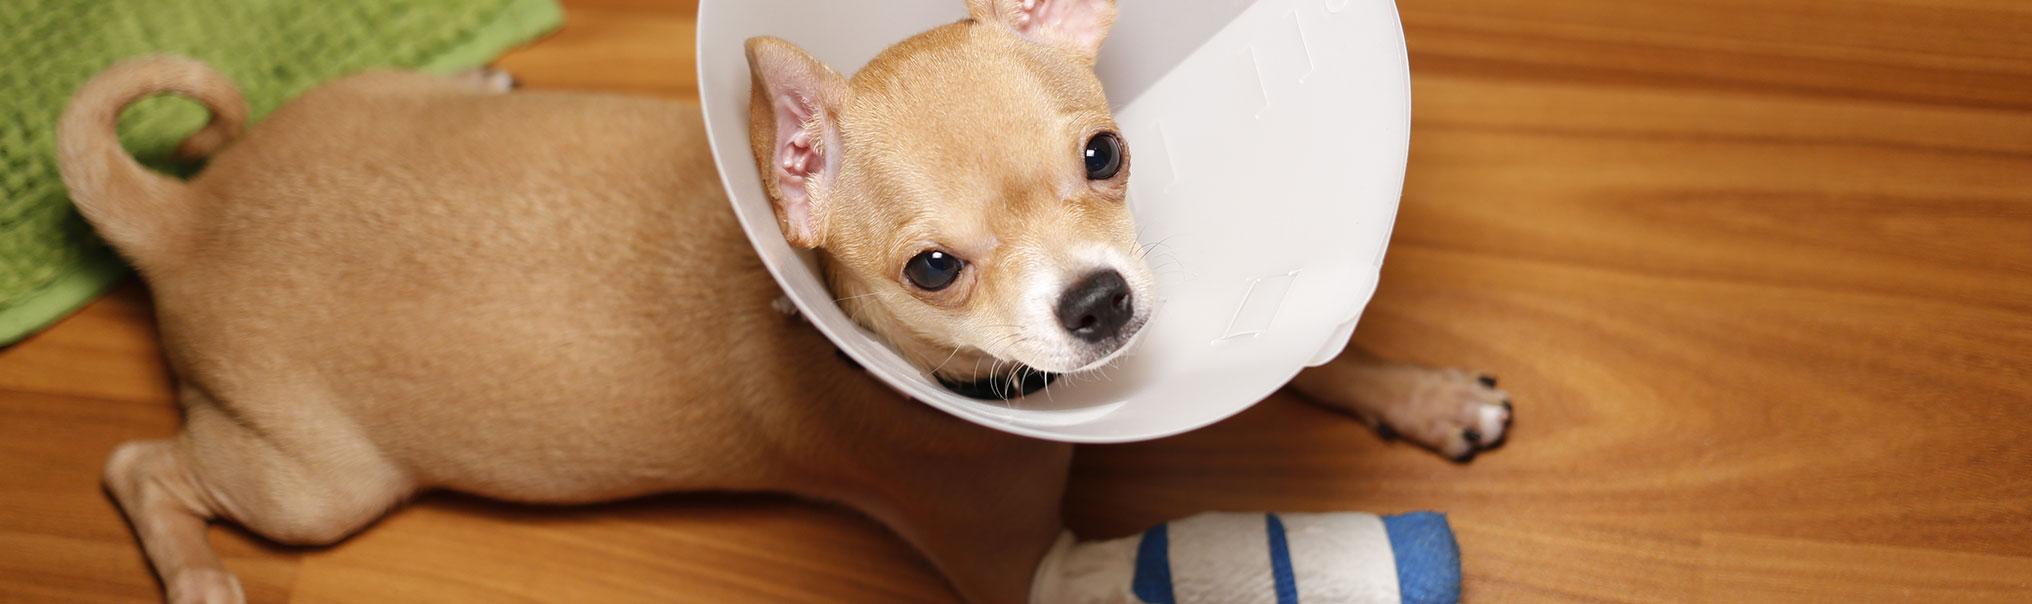 dog orthopedic surgeon near me